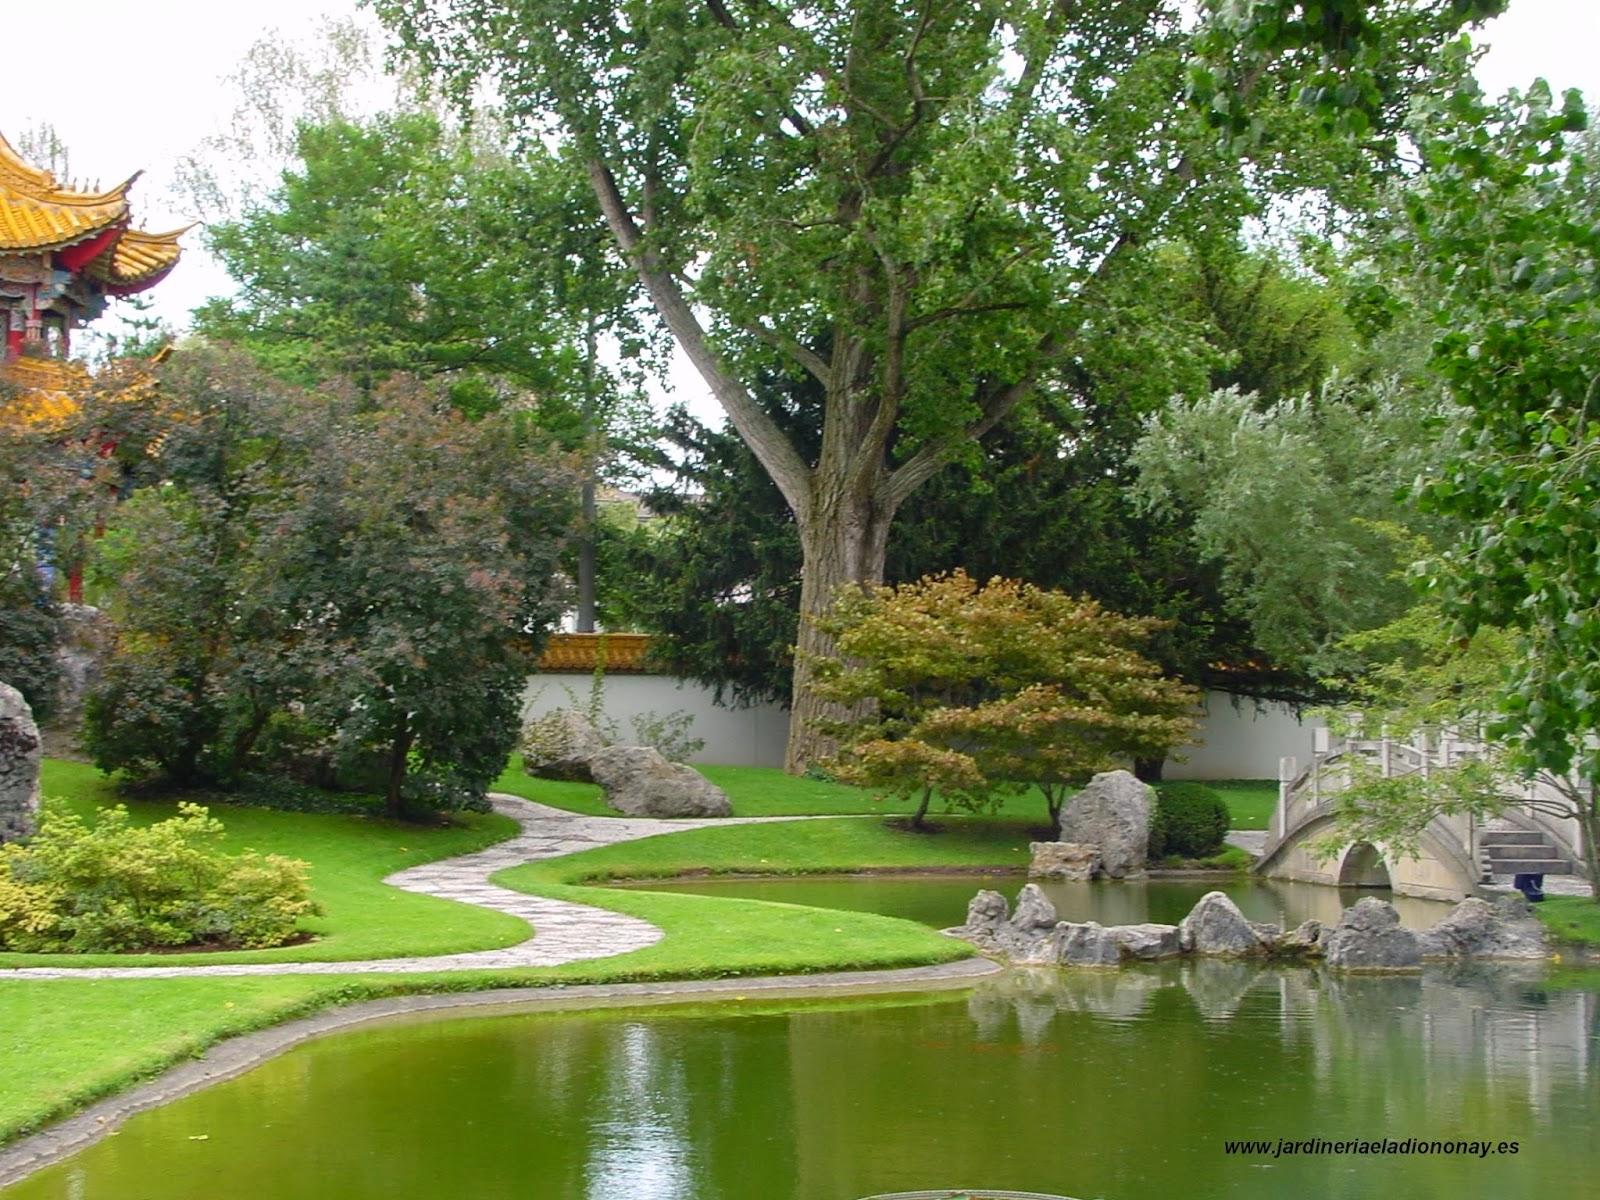 Jardineria eladio nonay jard n chino de z rich for Jardin chino